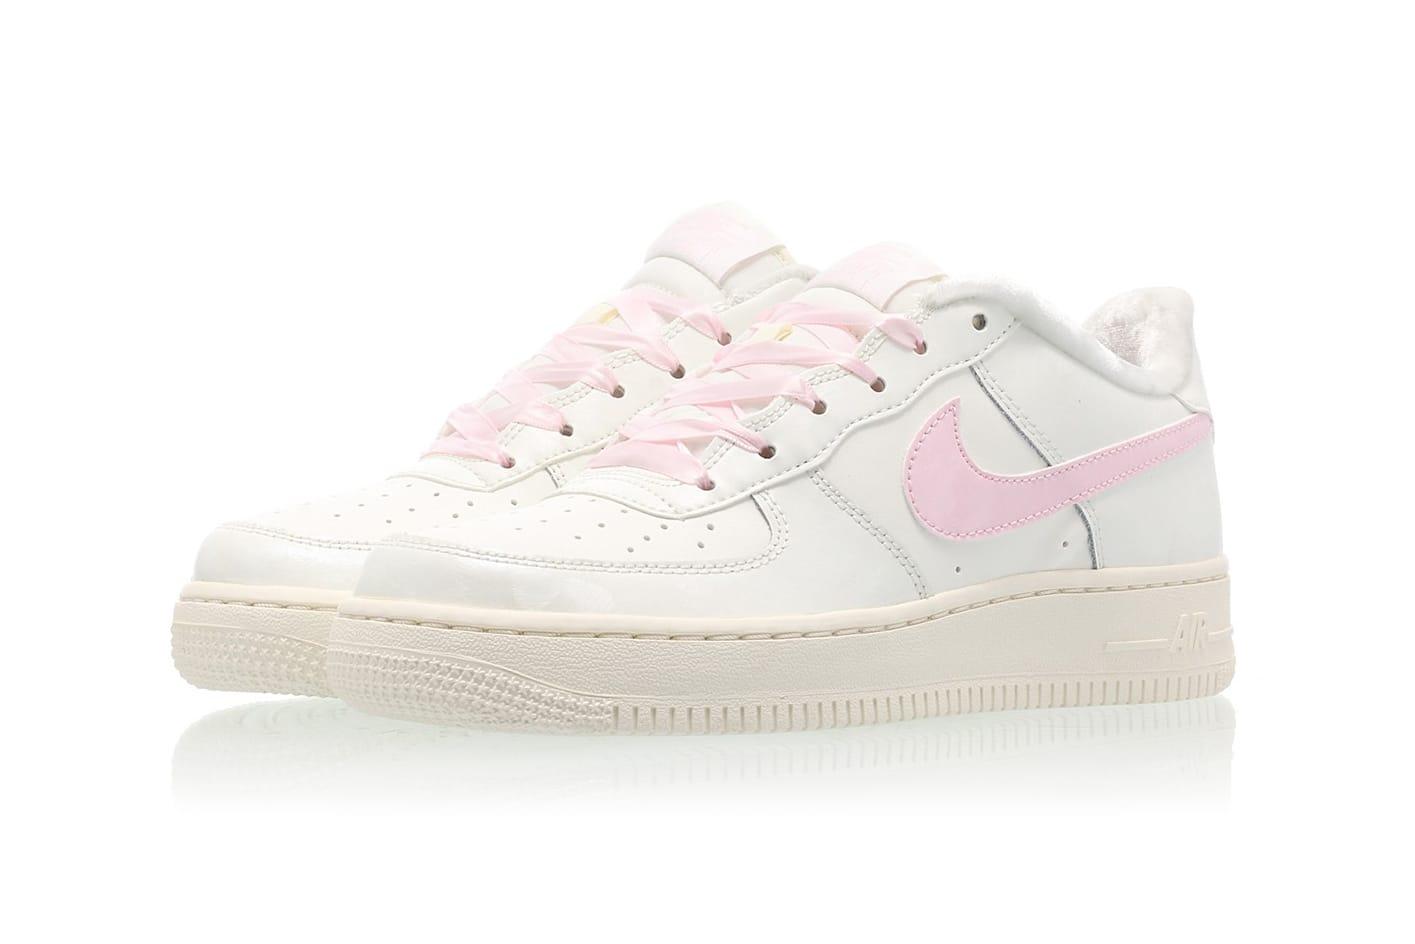 Millennial Pink Fur-Lined Air Force 1